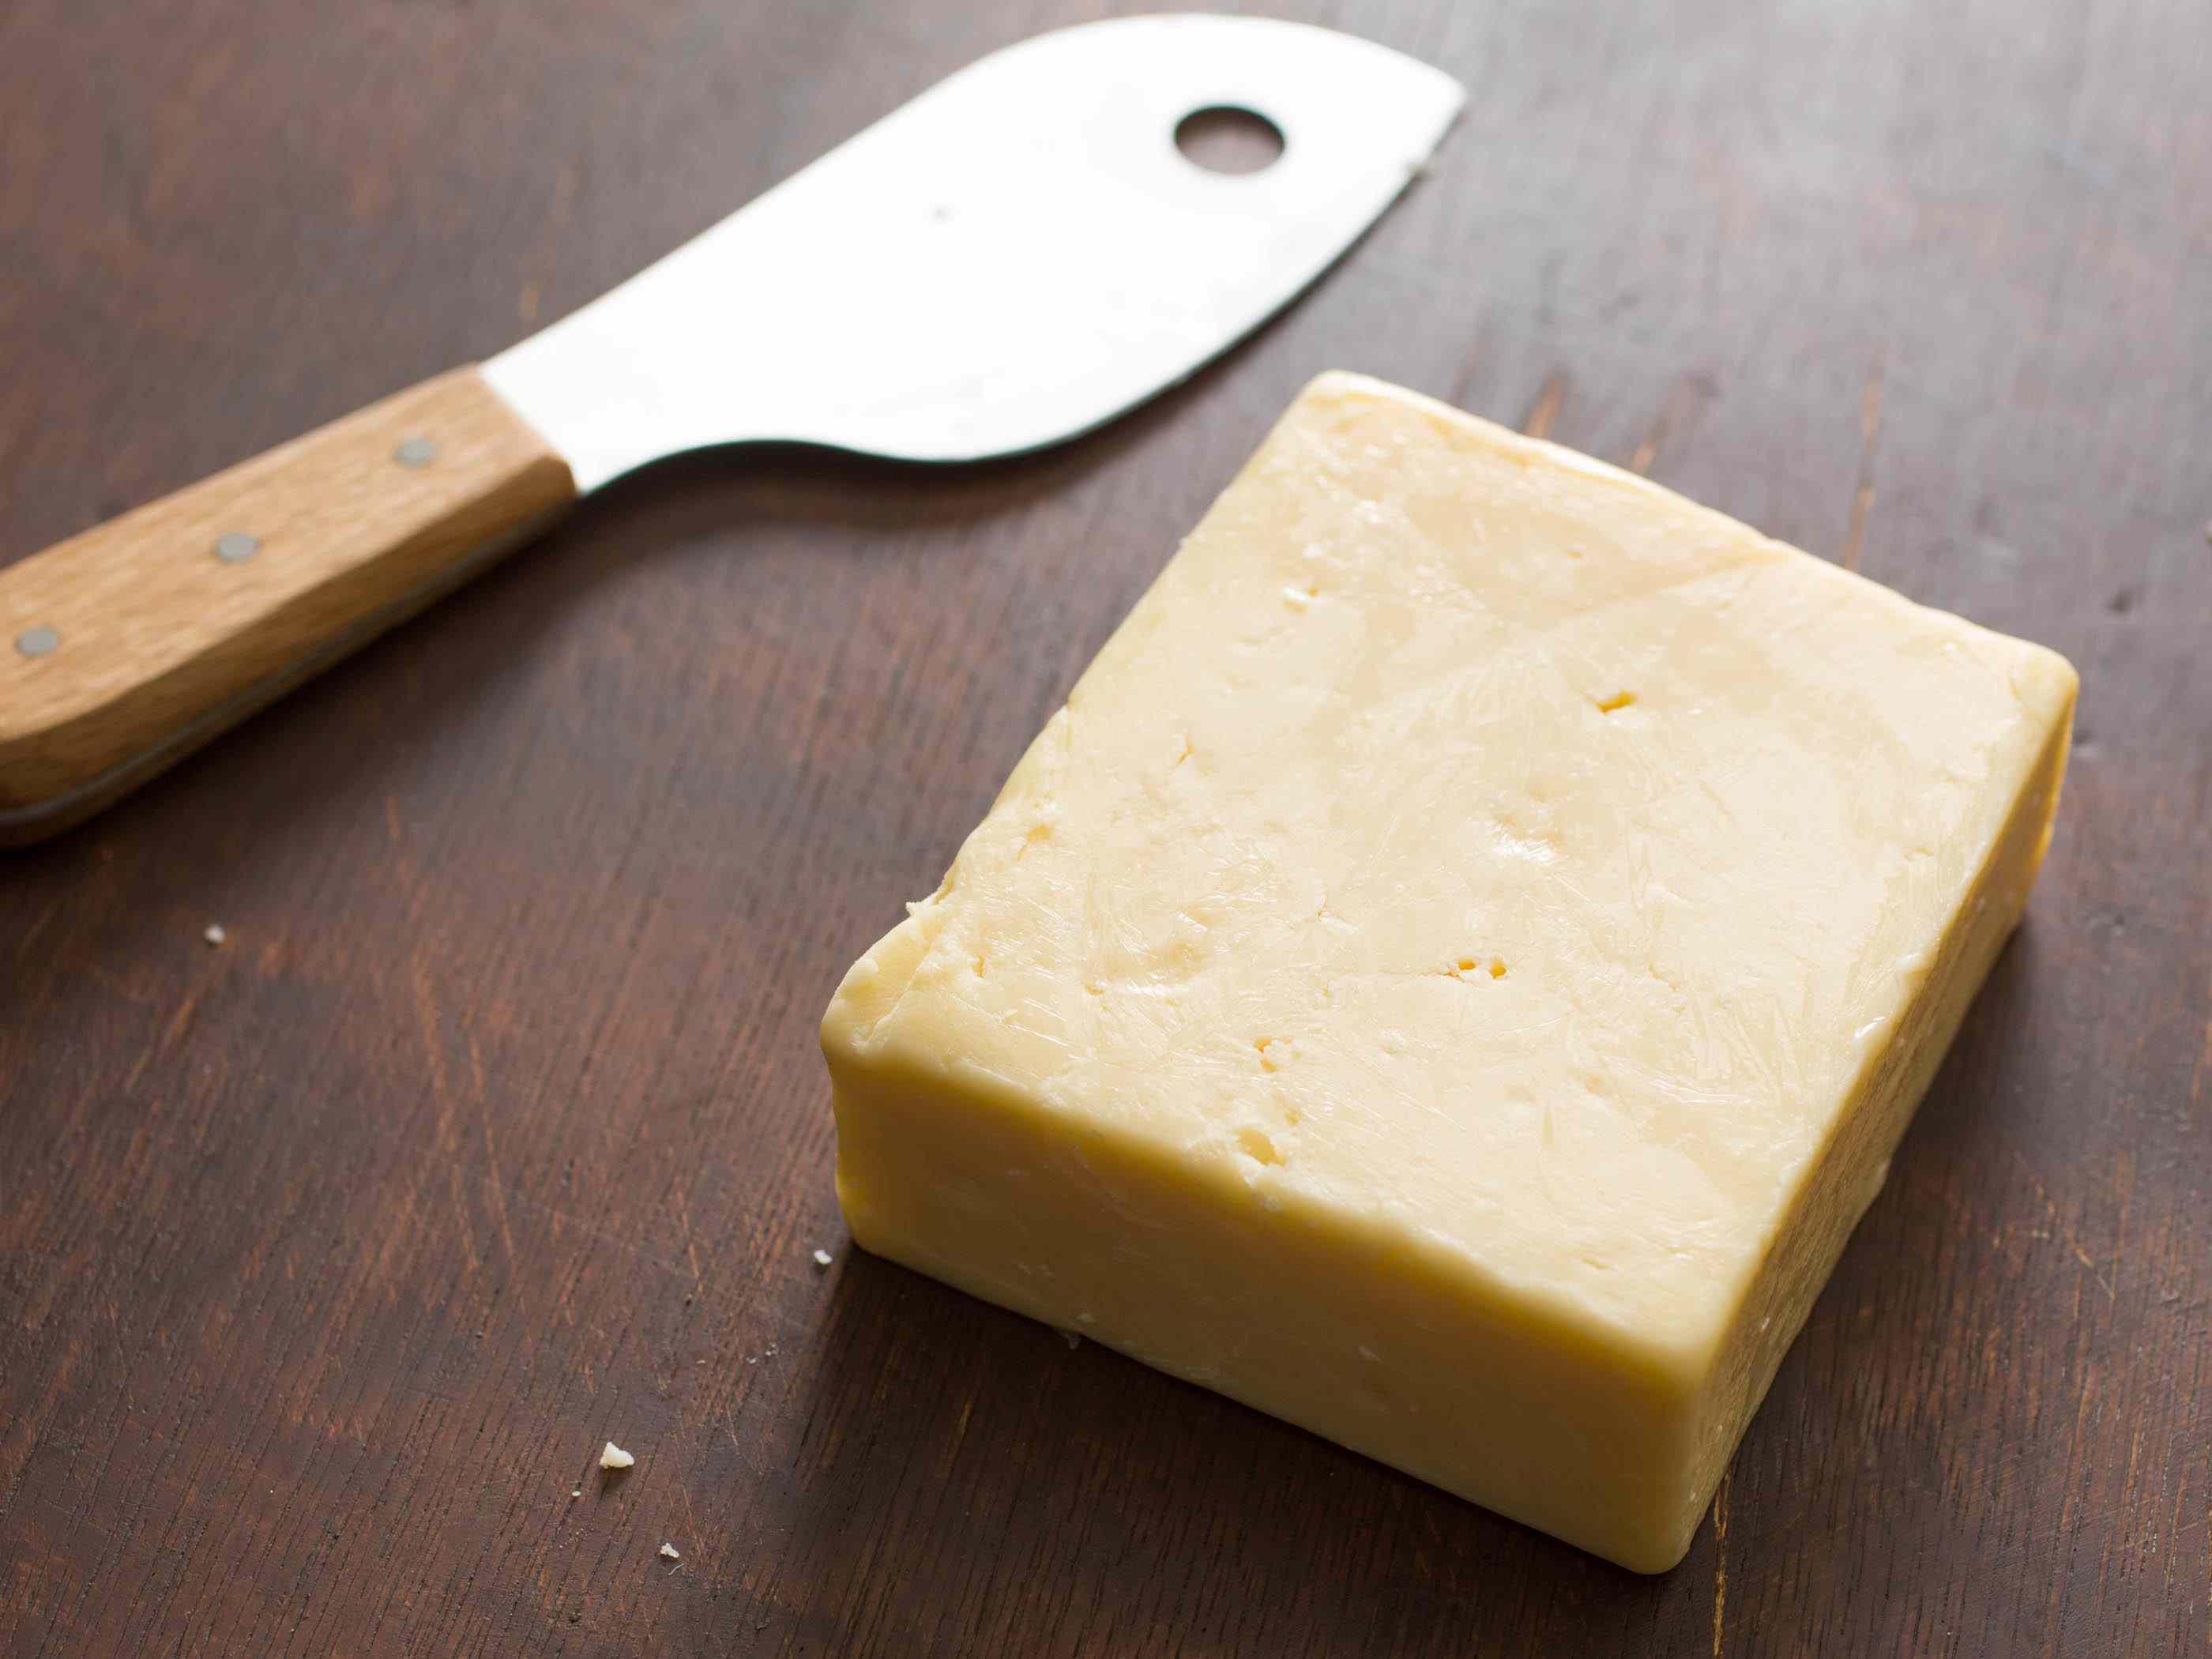 20141121-midwestern-cheese-milton-creamery-prairie-breeze-vicky-wasik-2.jpg